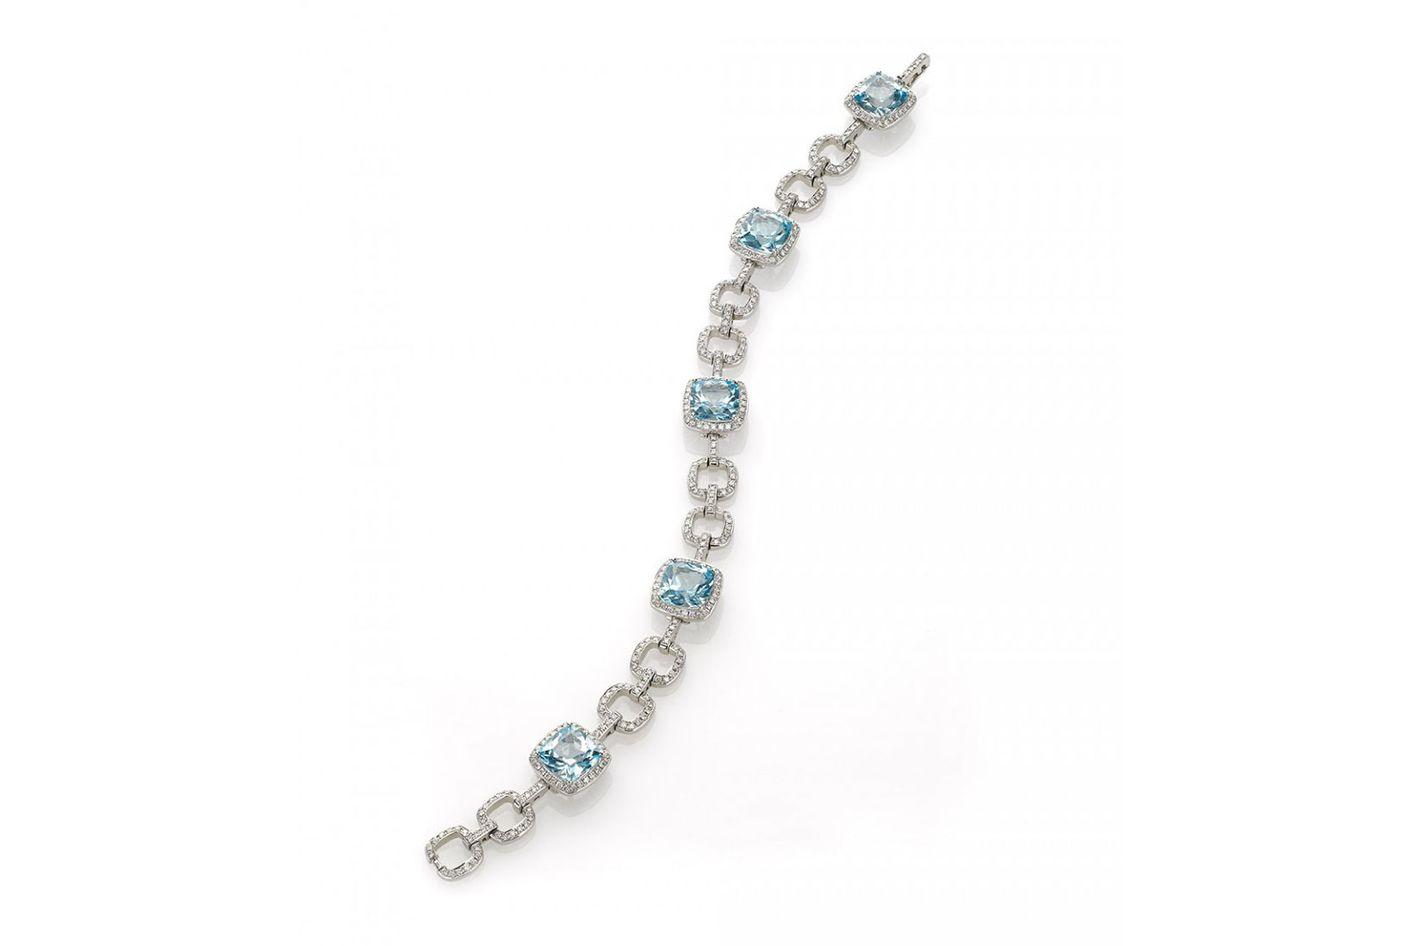 Eiseman Collection, 18 Karat White Gold, 5 Blue Topaz Gemstones With 340 Pave Diamonds